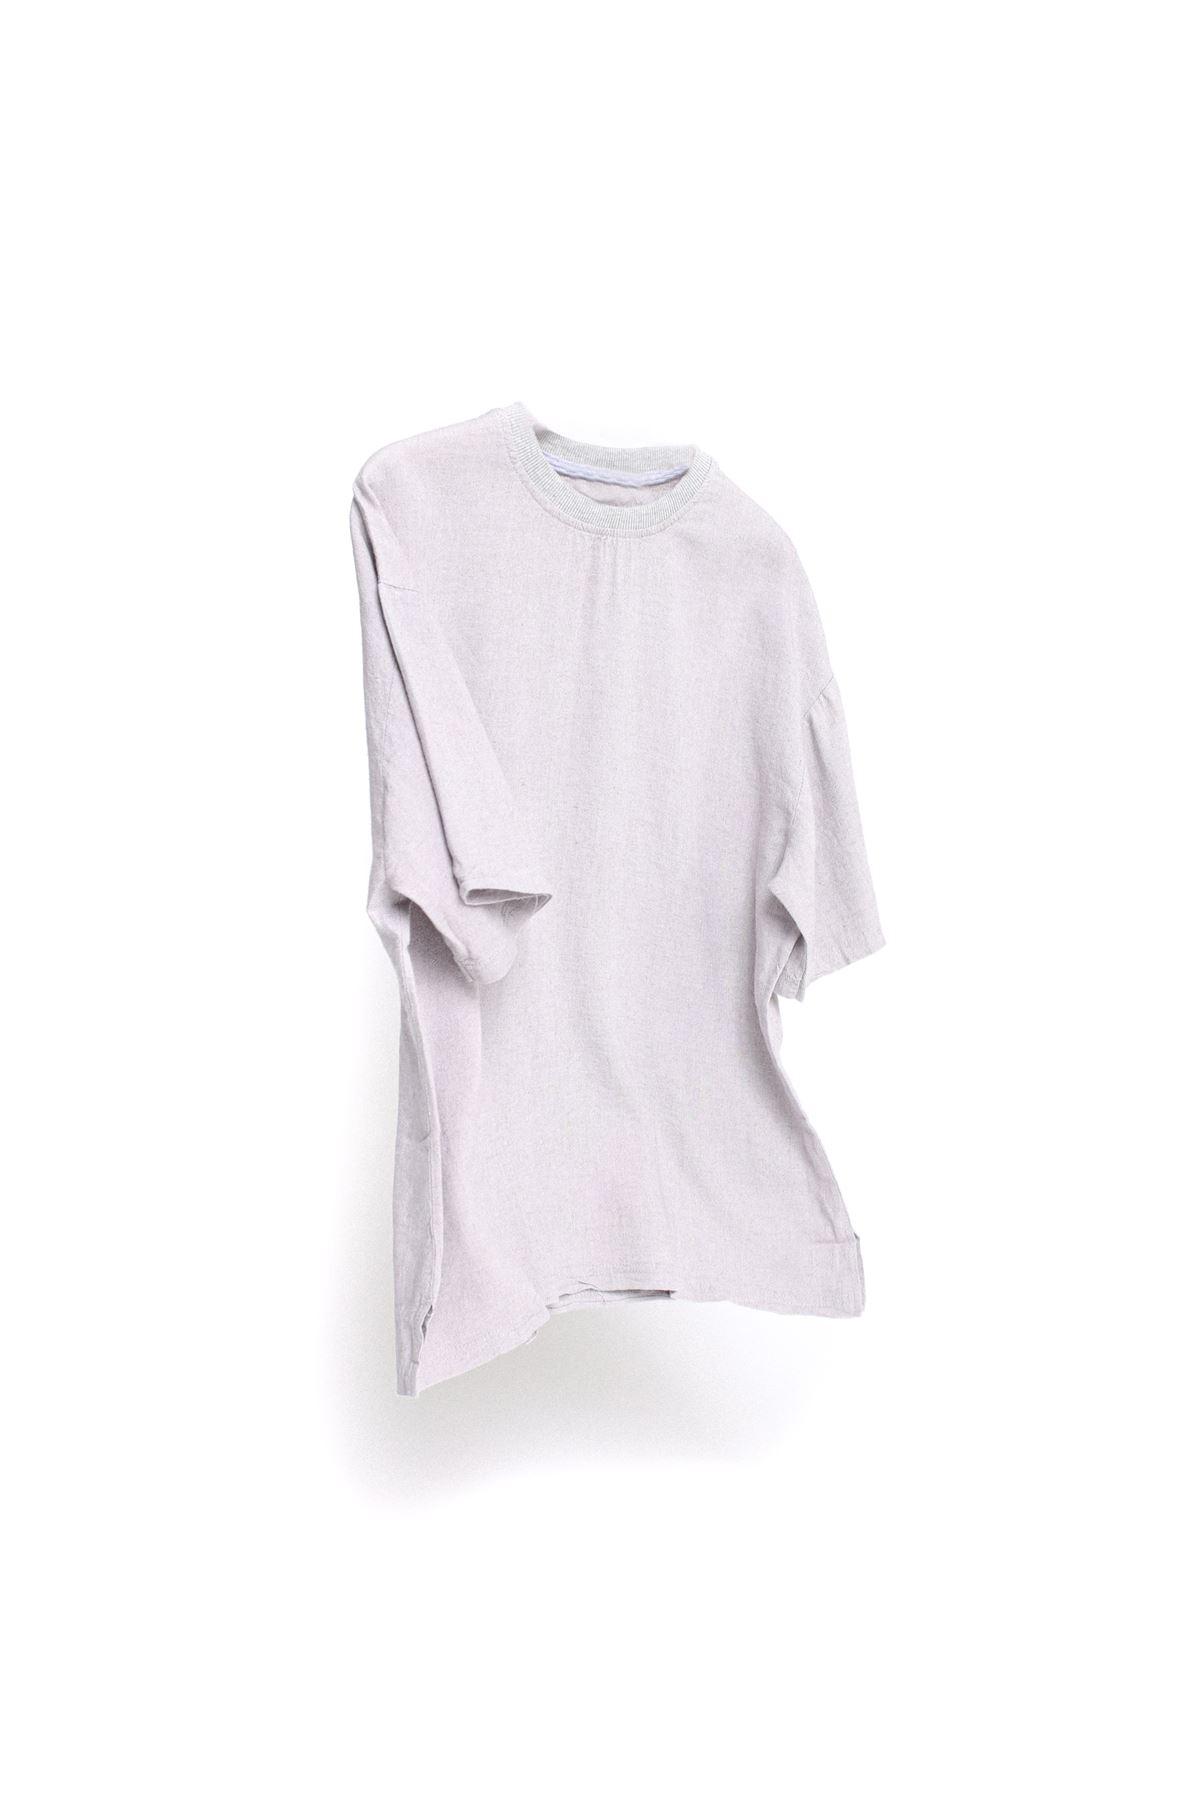 Gri Keten T-Shirt Boru Paça Vizon Keten Jogger Kombin